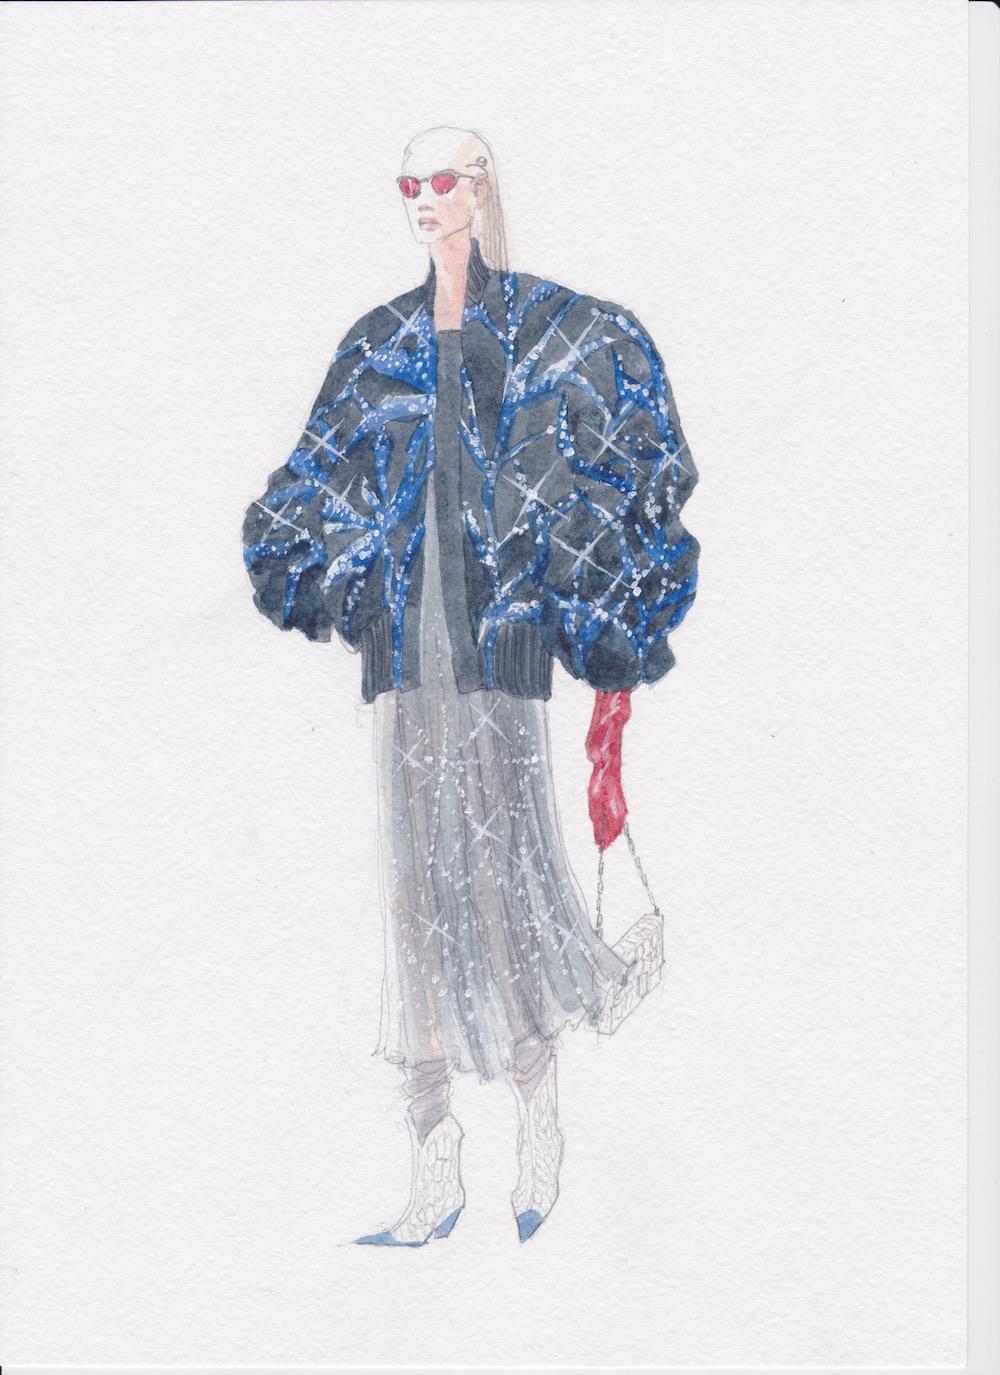 MA Fashion Design Technology Womenswear student Dmitry Gotsfrid wins Armani competition.